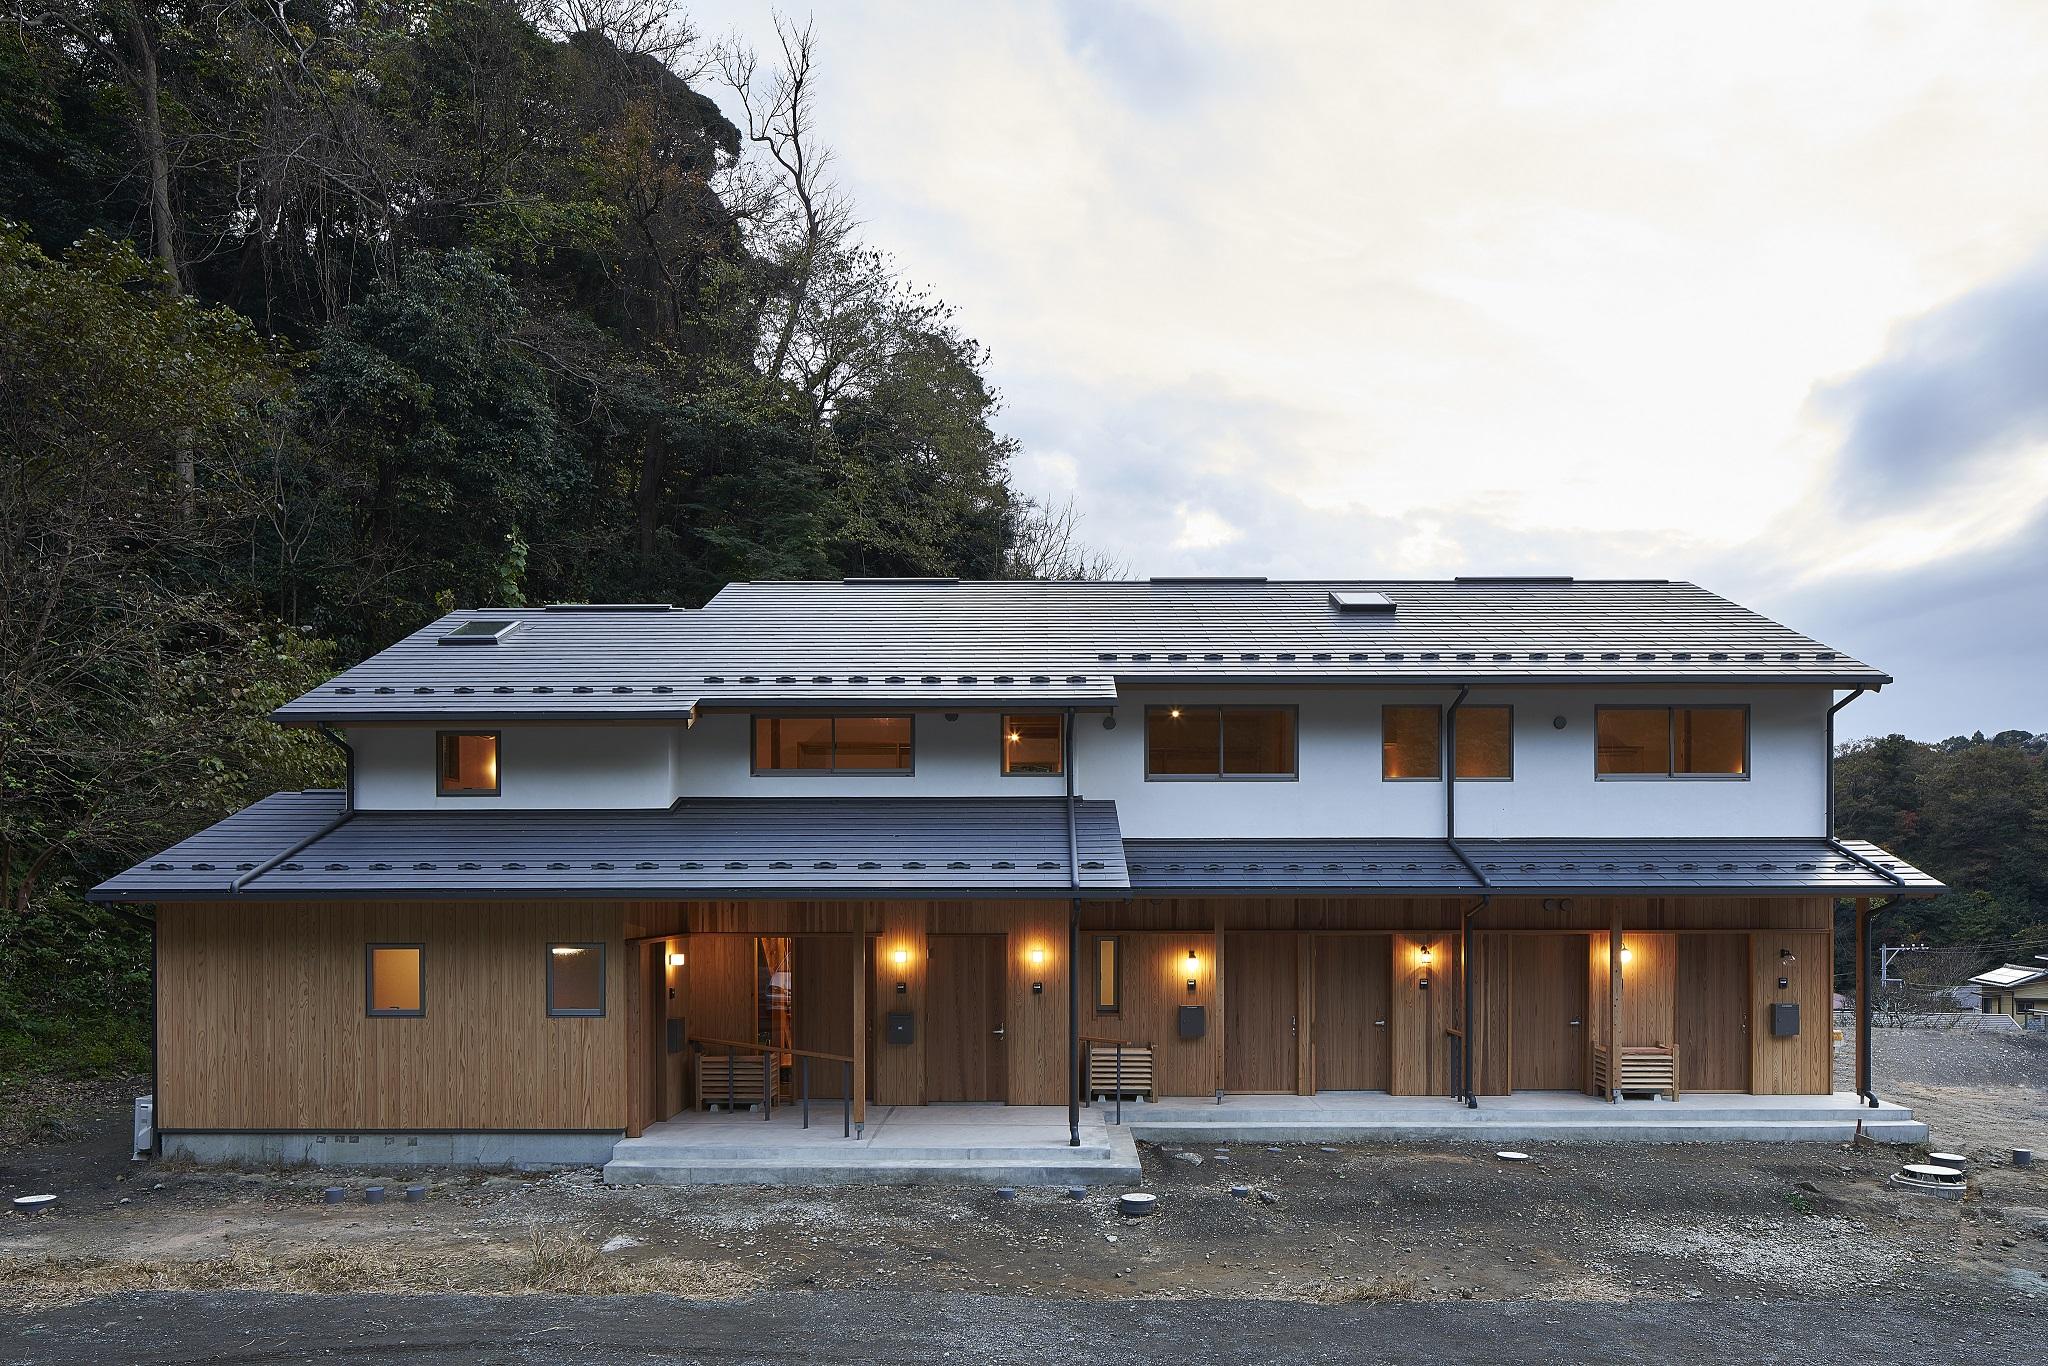 鎌倉の長屋|kamakura_kanagawa|神奈川|©角悠一郎